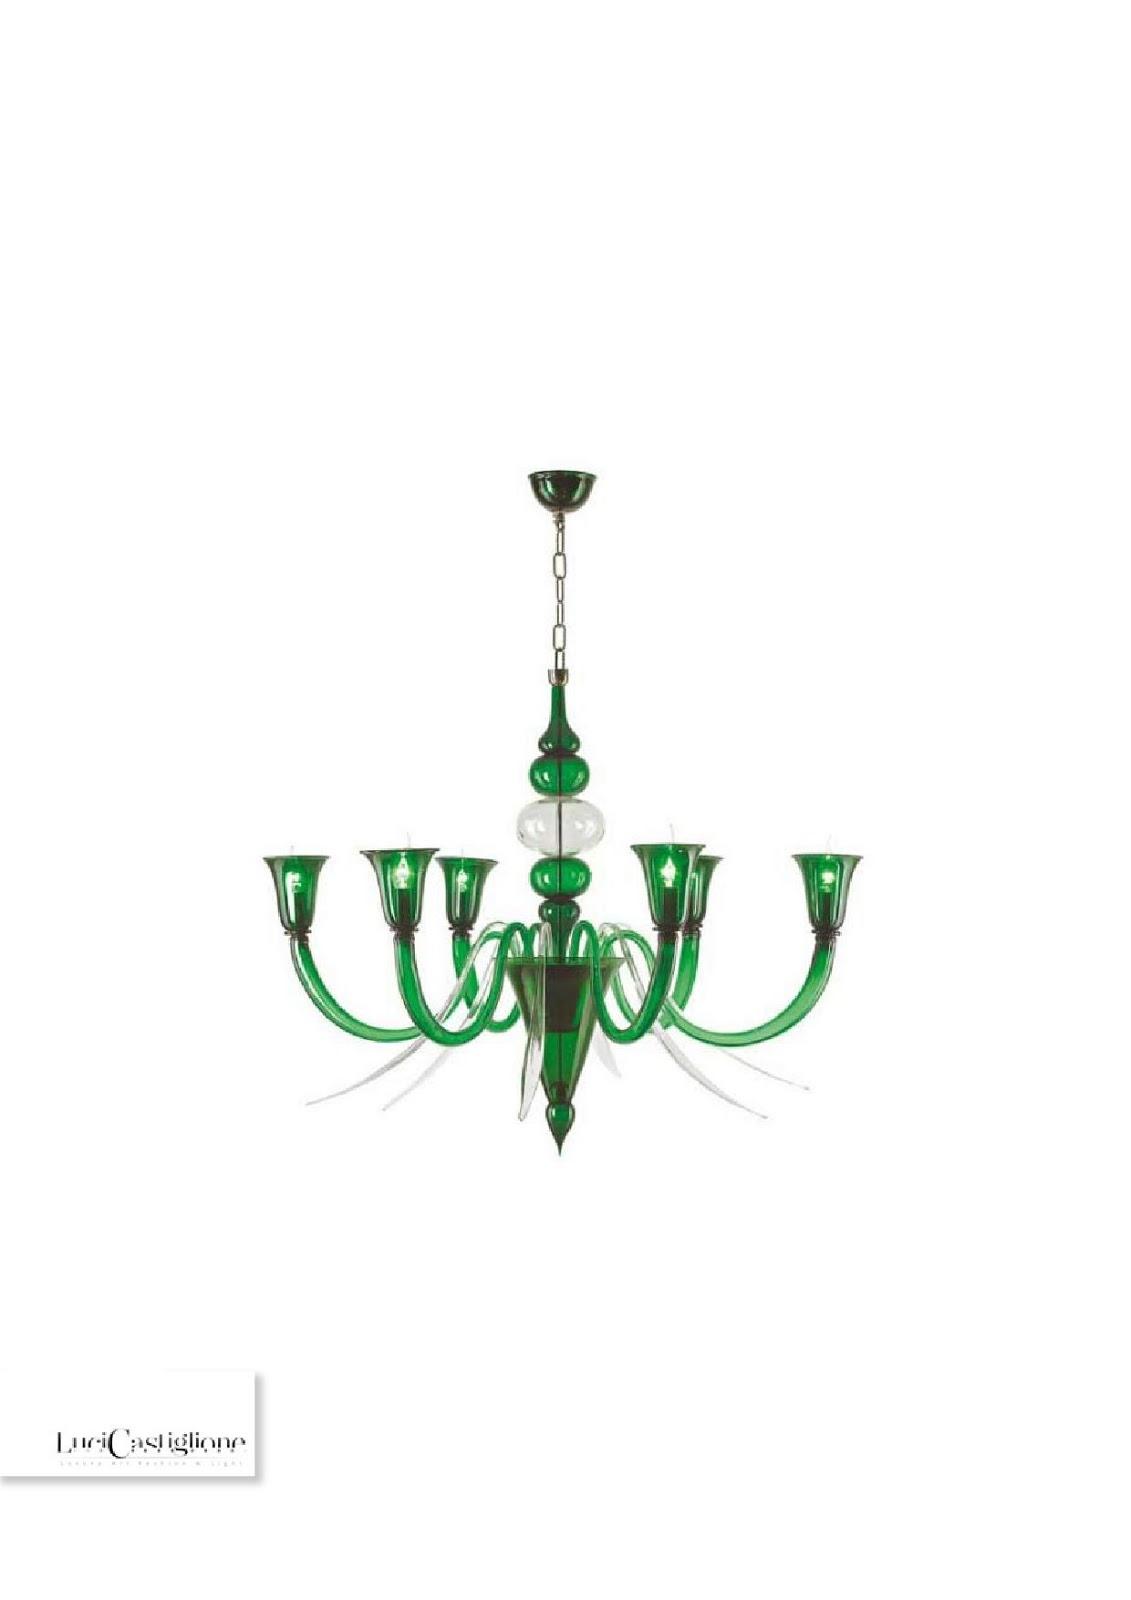 montaggio lampadari : Lampadari in vetro di murano: 471 lampadario in vetro di murano vedi ...